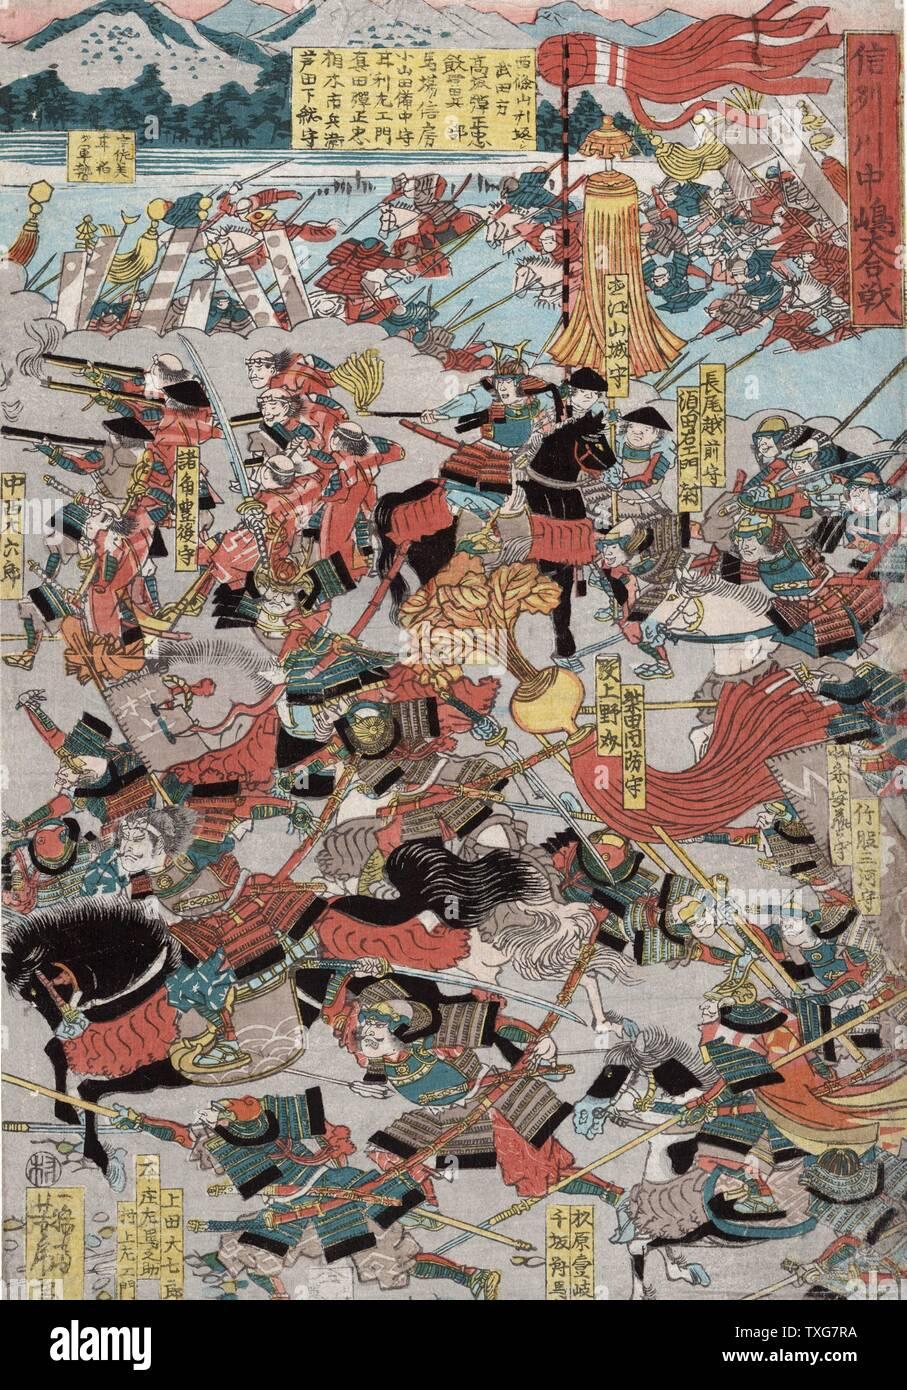 Utagawa Yoshitoro Japanese school The Great Battle of Kawanakjima in Shinsu: probably the 1561 fourth  battle between the warlords Takeda Shingen and Uesugi Keushin on the plains of the Chikmu River Woodblock Stock Photo